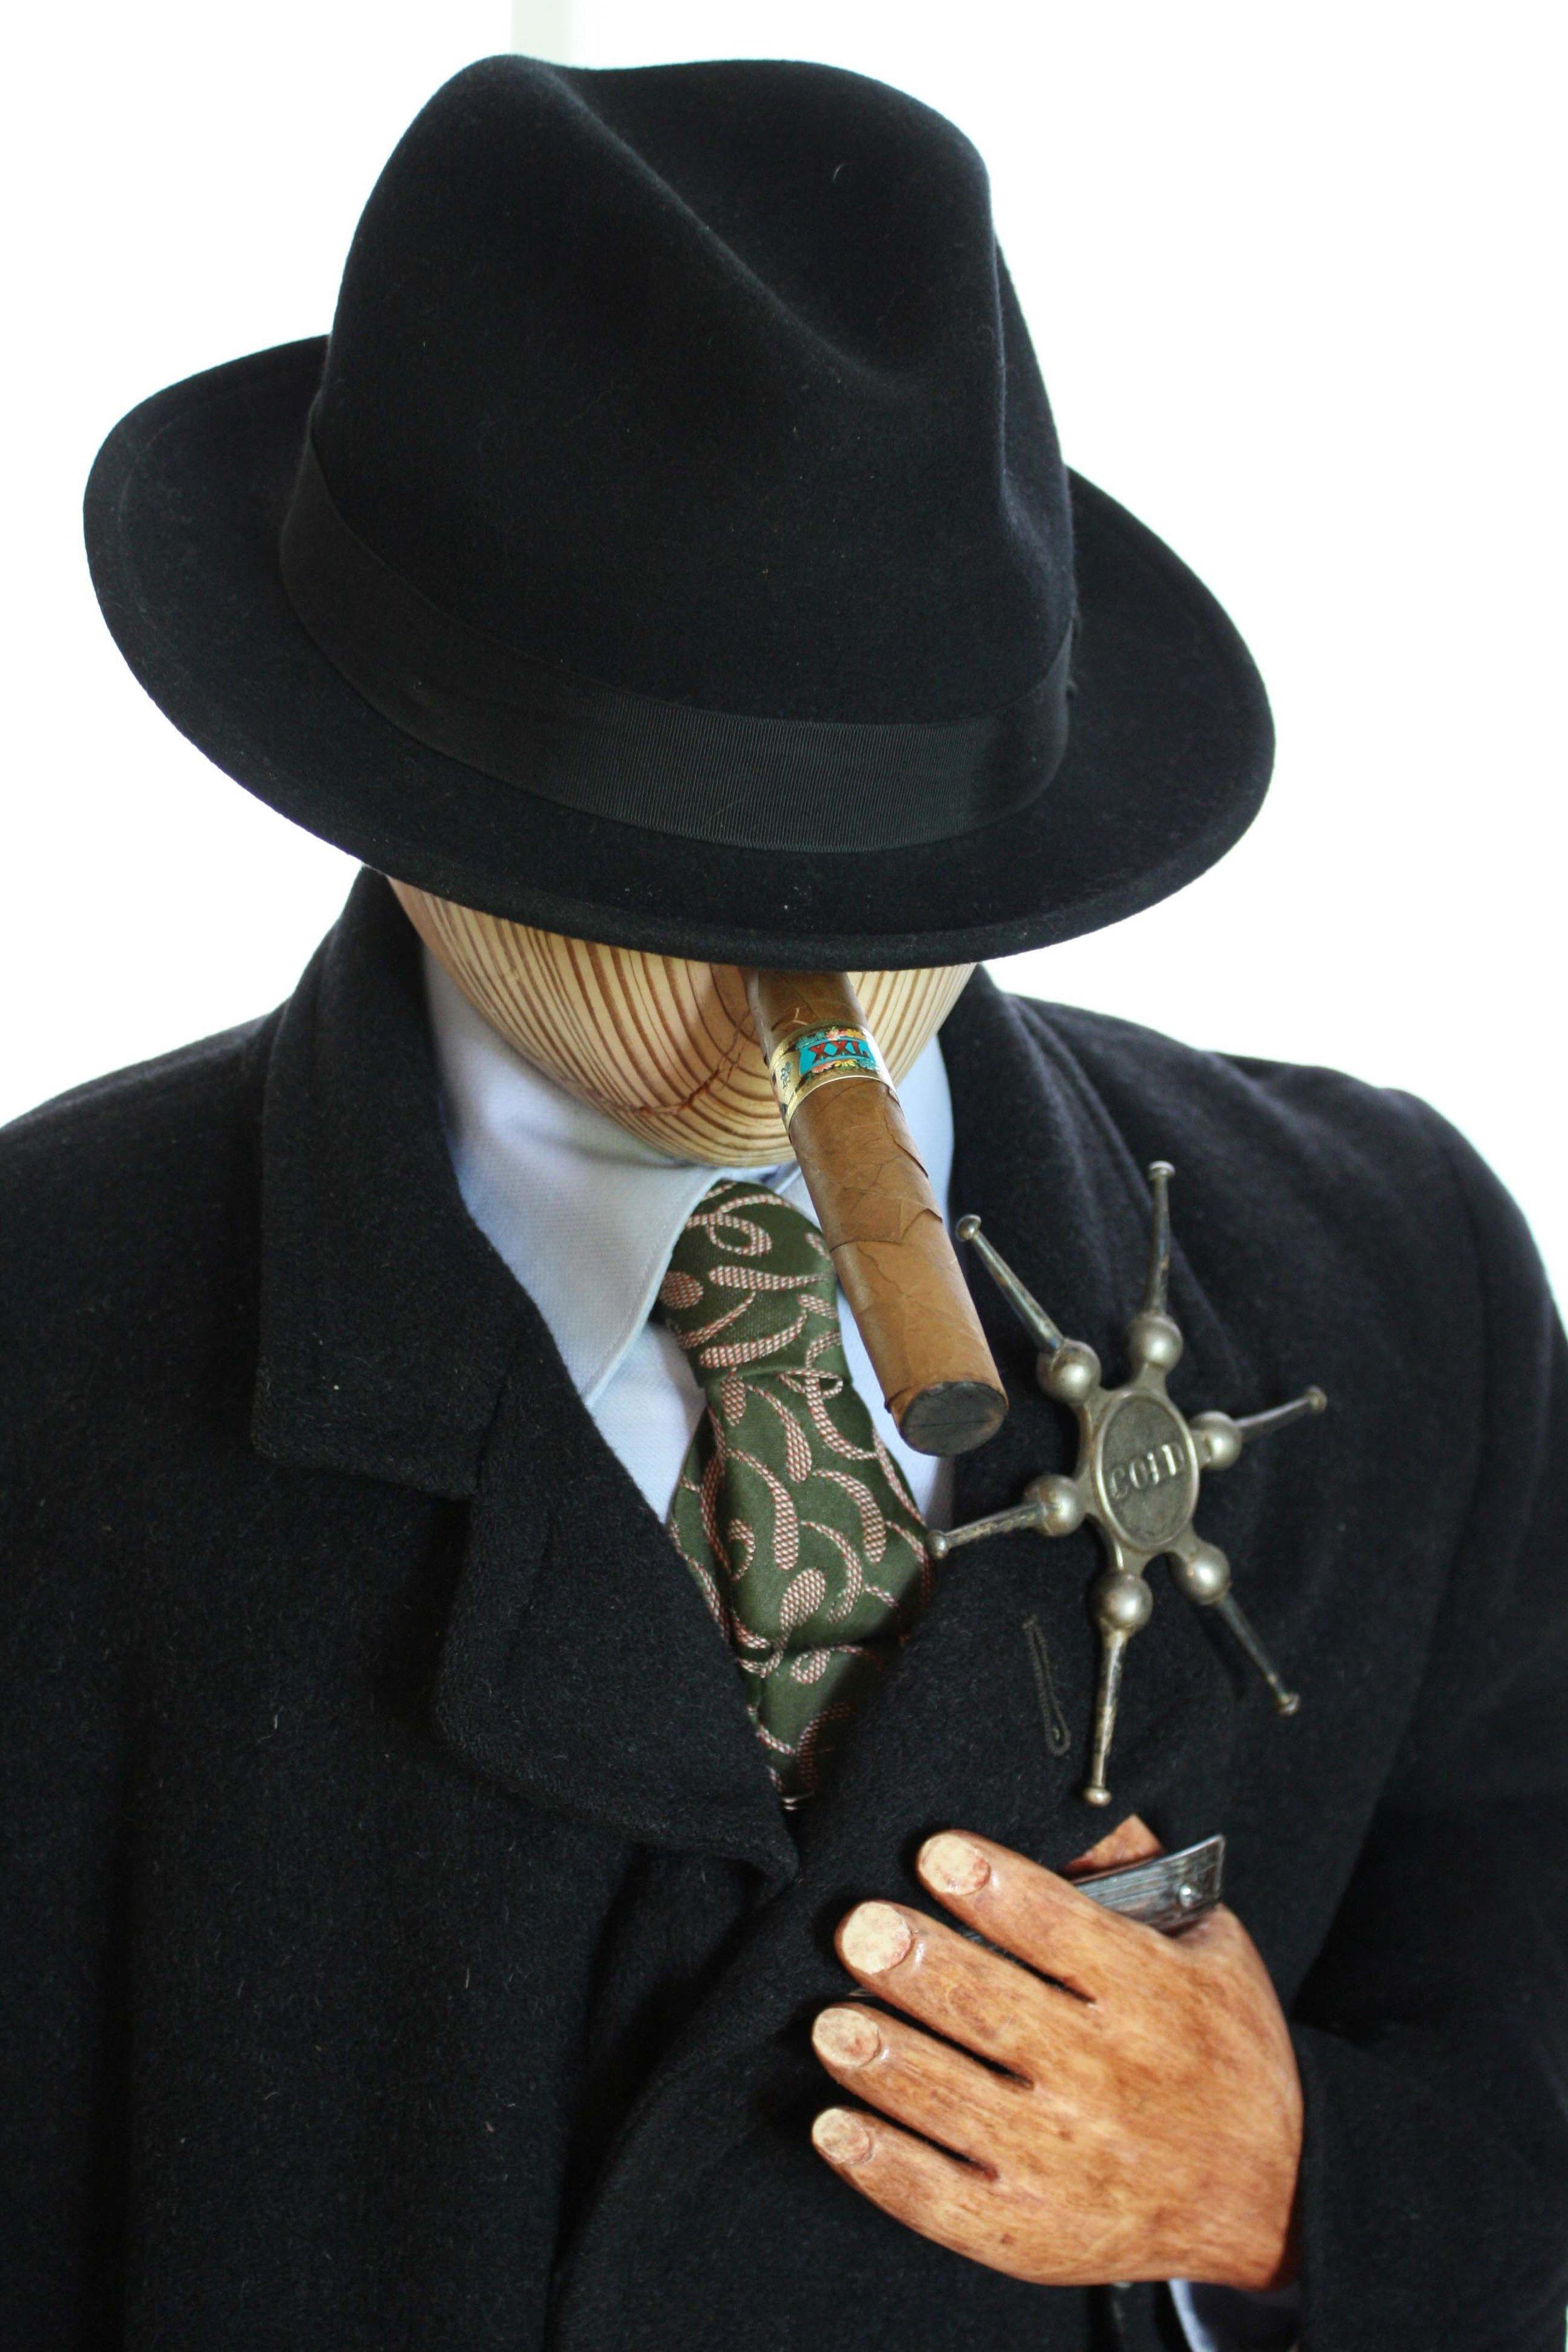 Nick (Cigar Smoker)